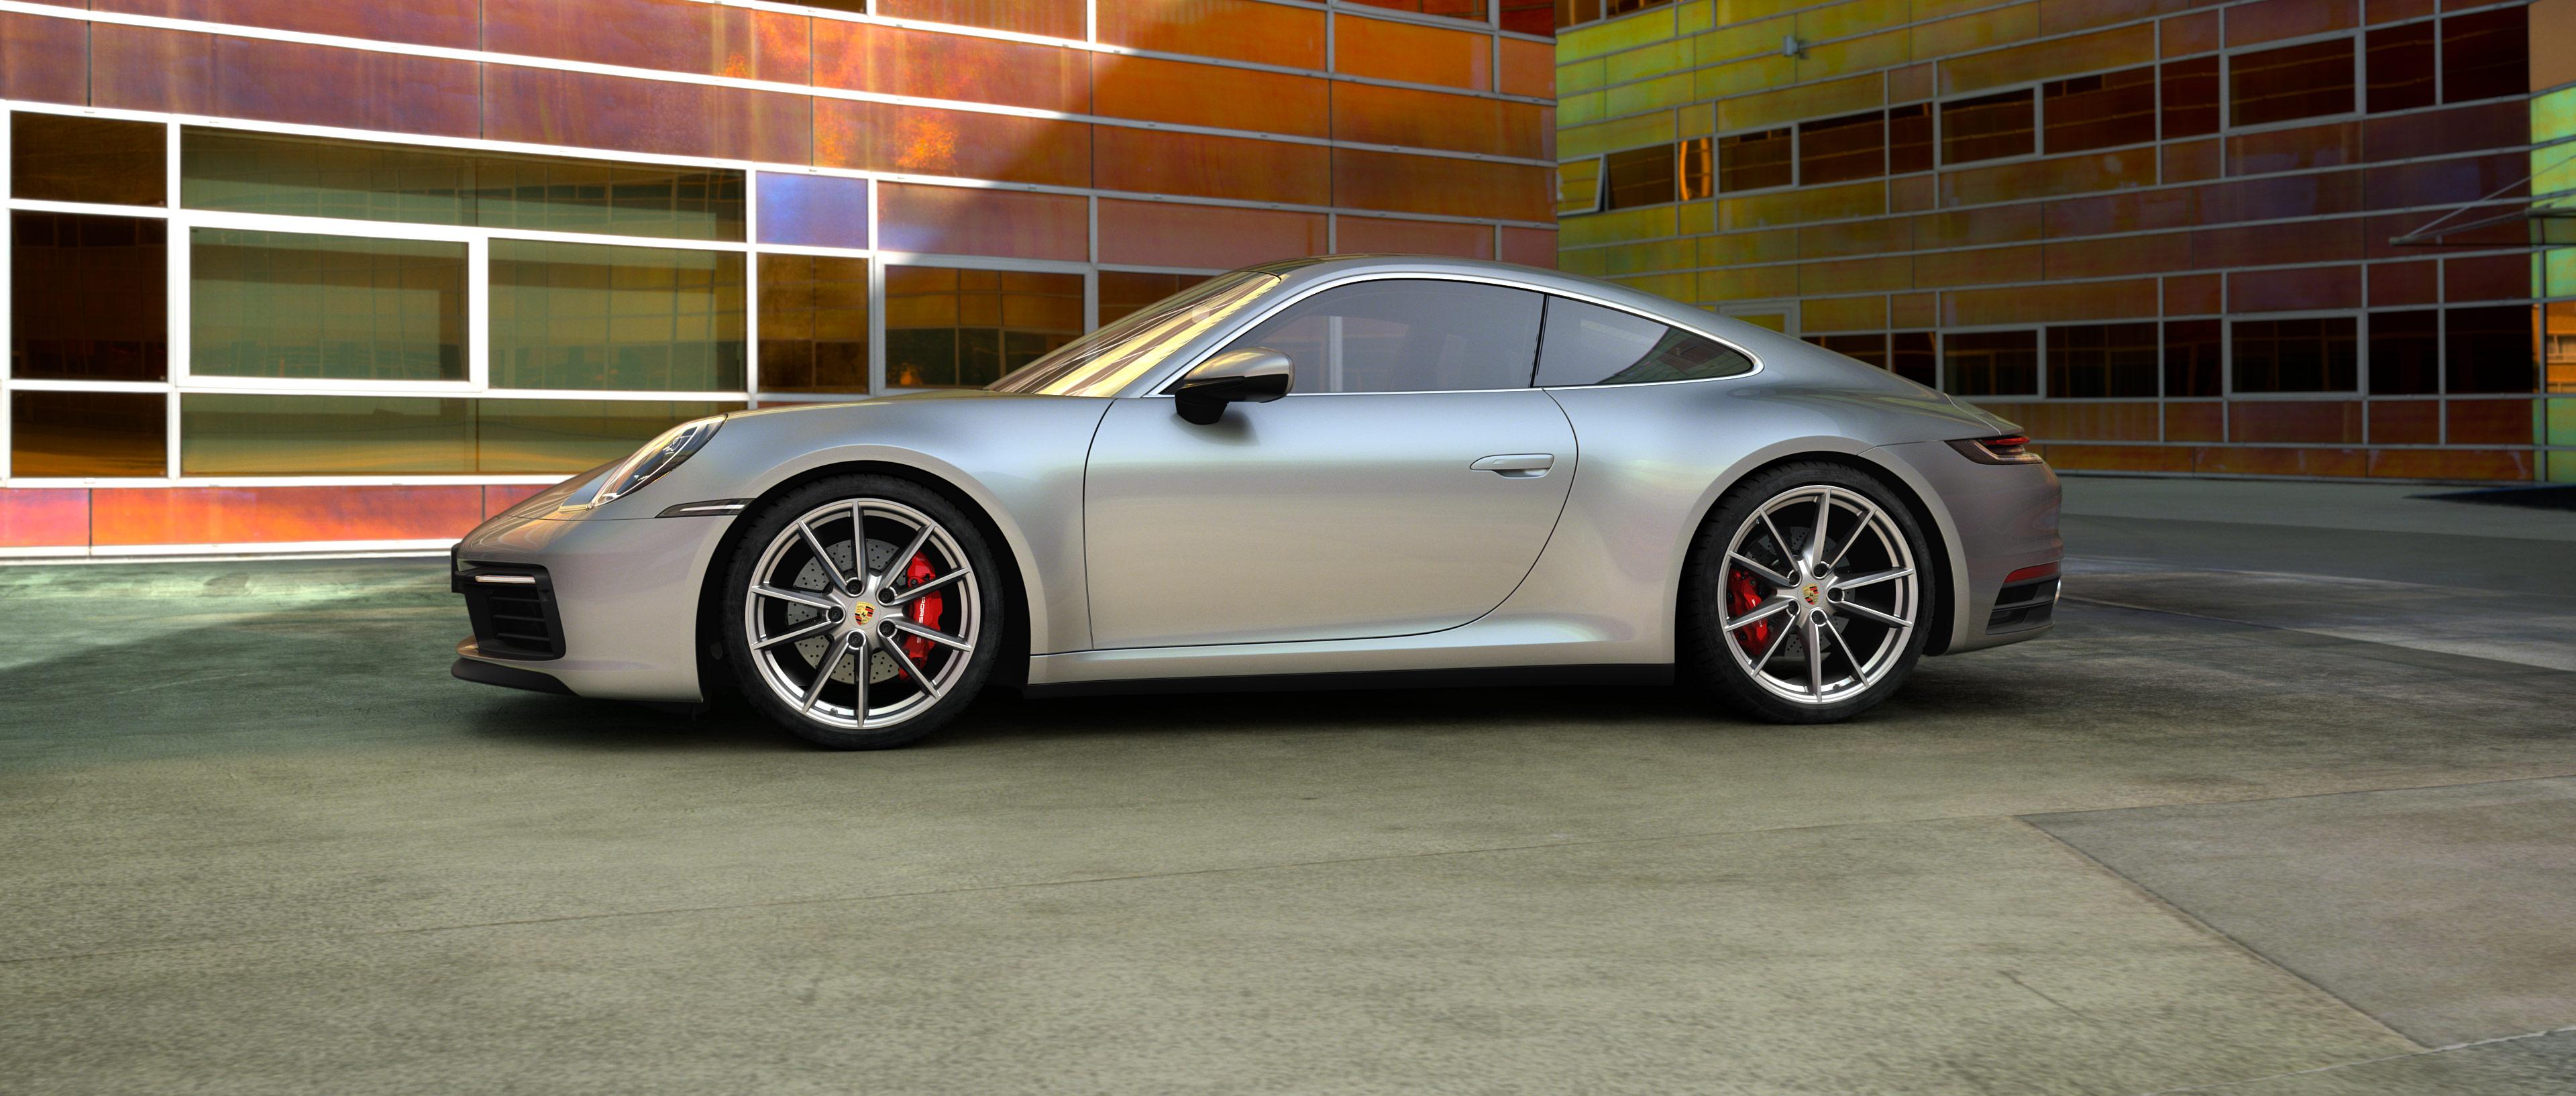 Full Version 2020 PORSCHE 911 Carrera 992 Series BROCHURE